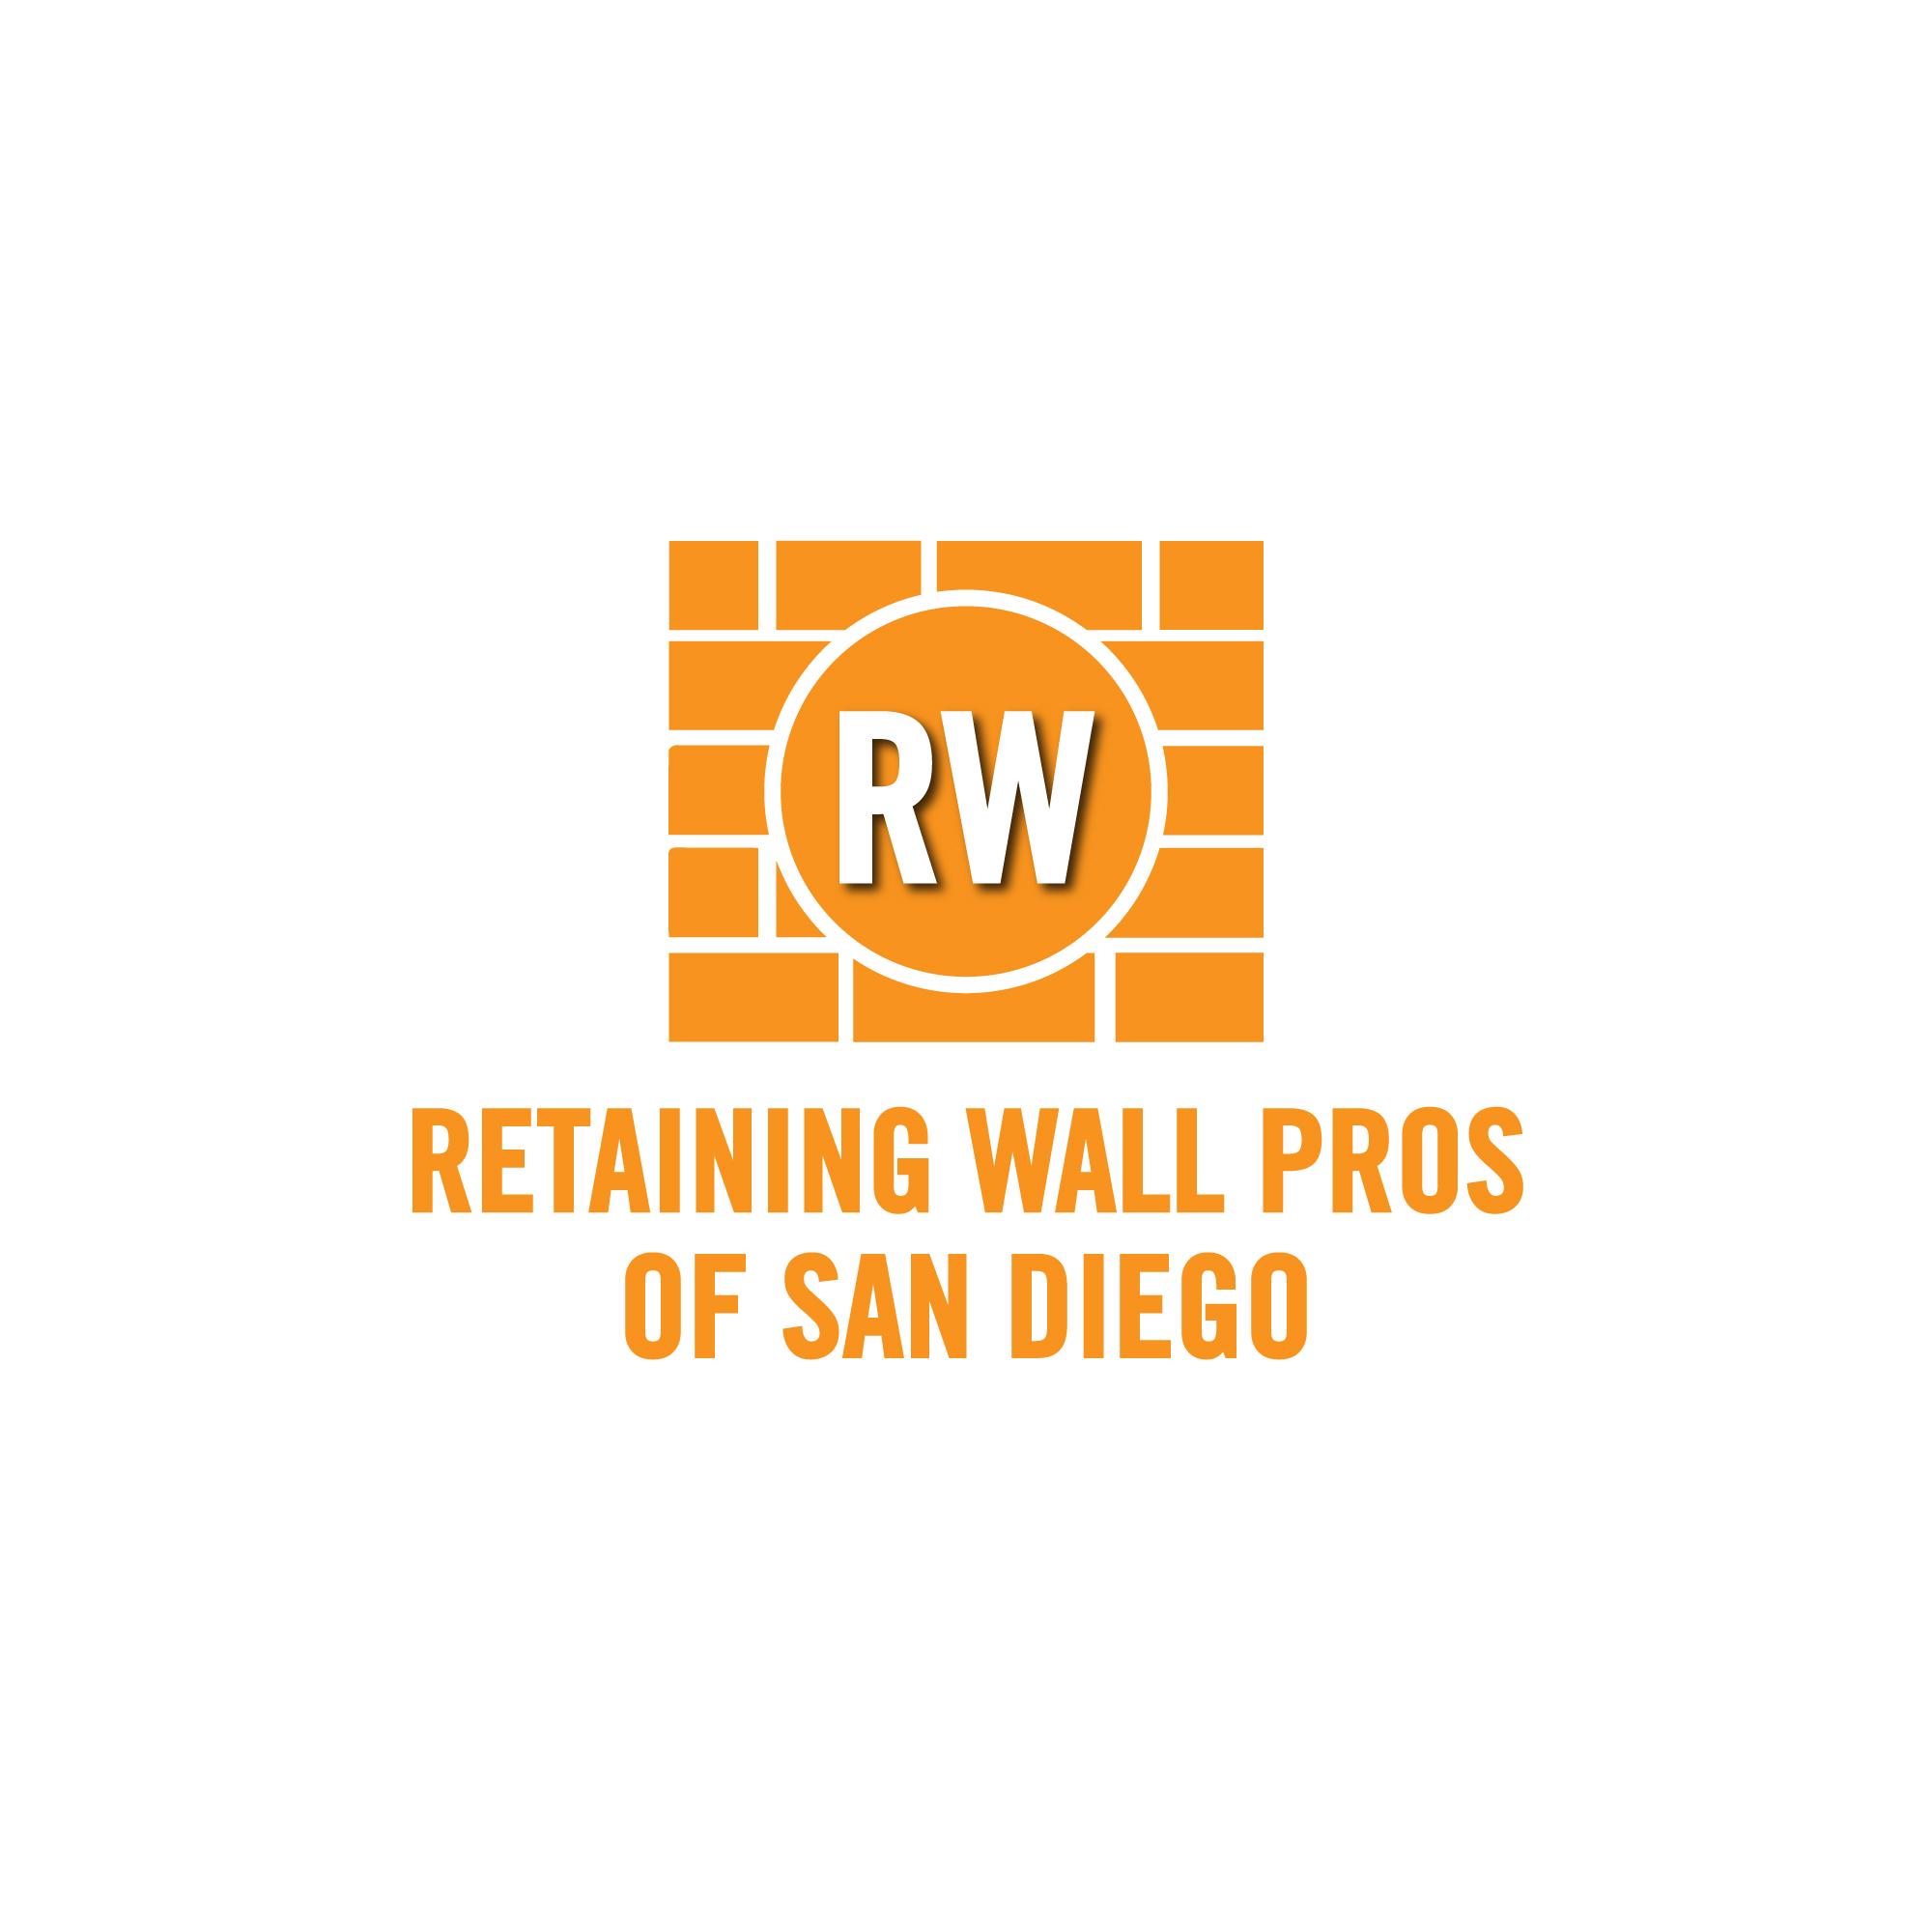 retaining-wall-logo.jpg